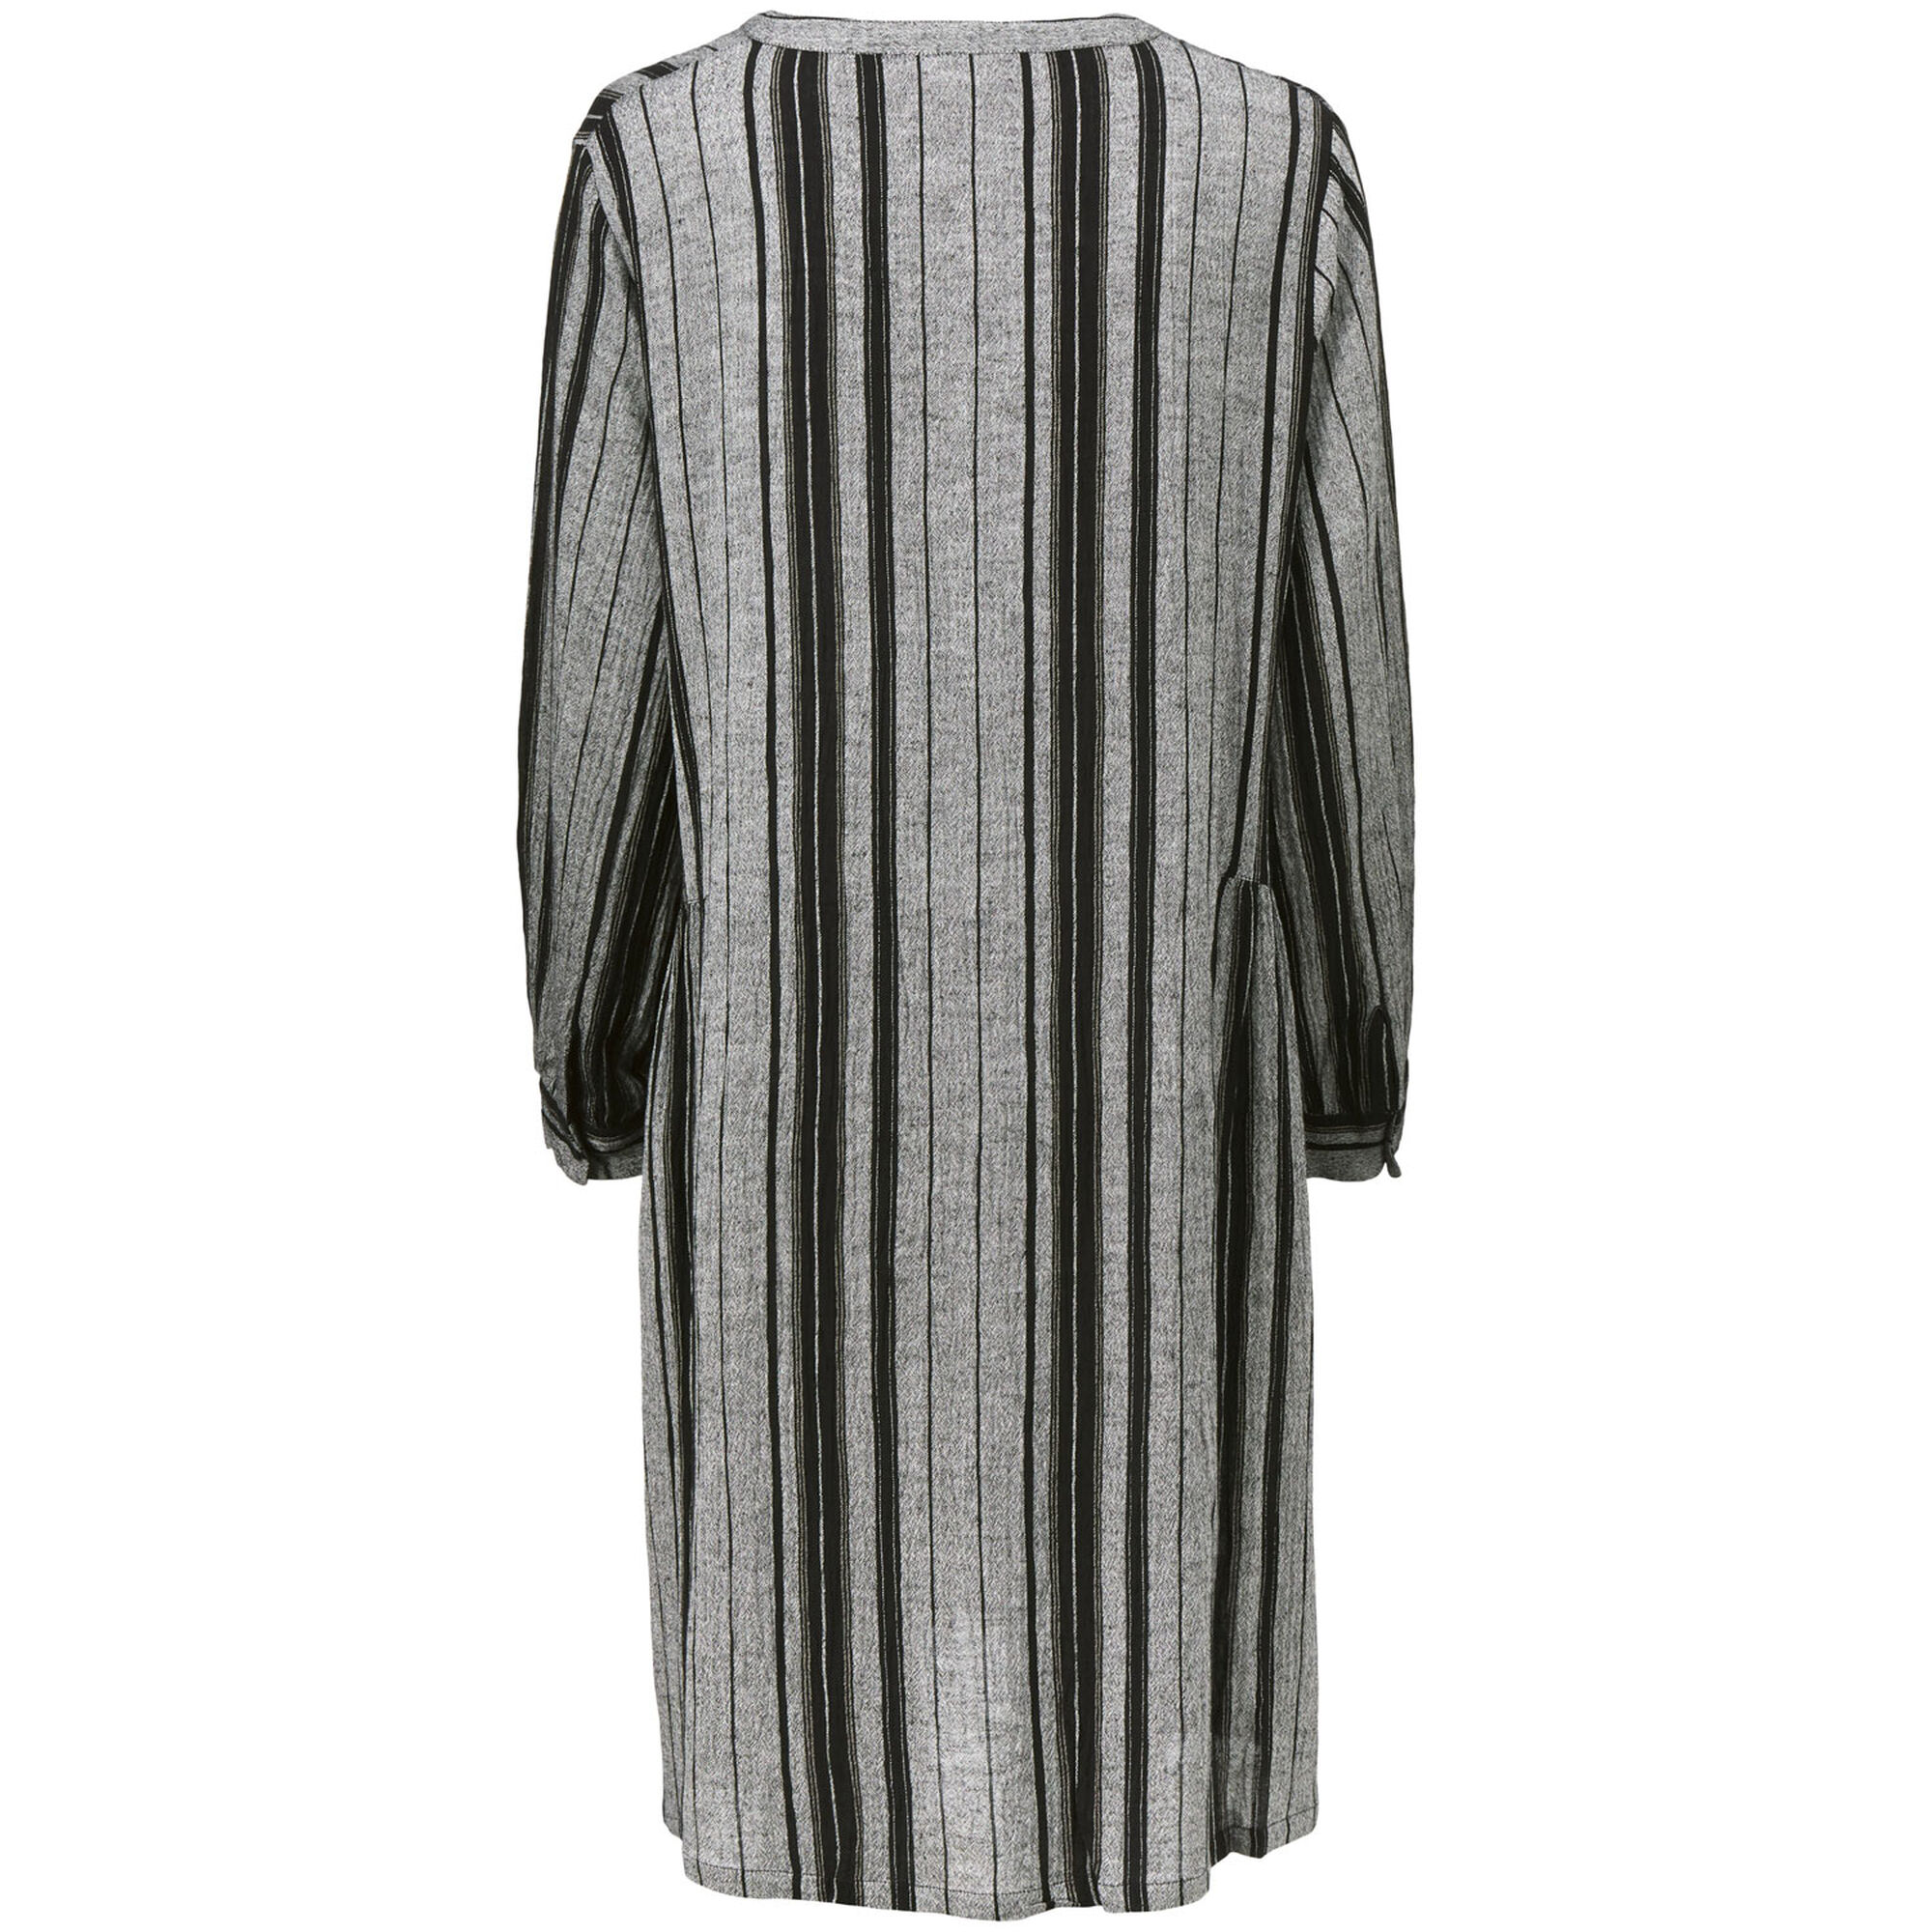 NELLY SHIRT DRESS, Roast Cashew, hi-res